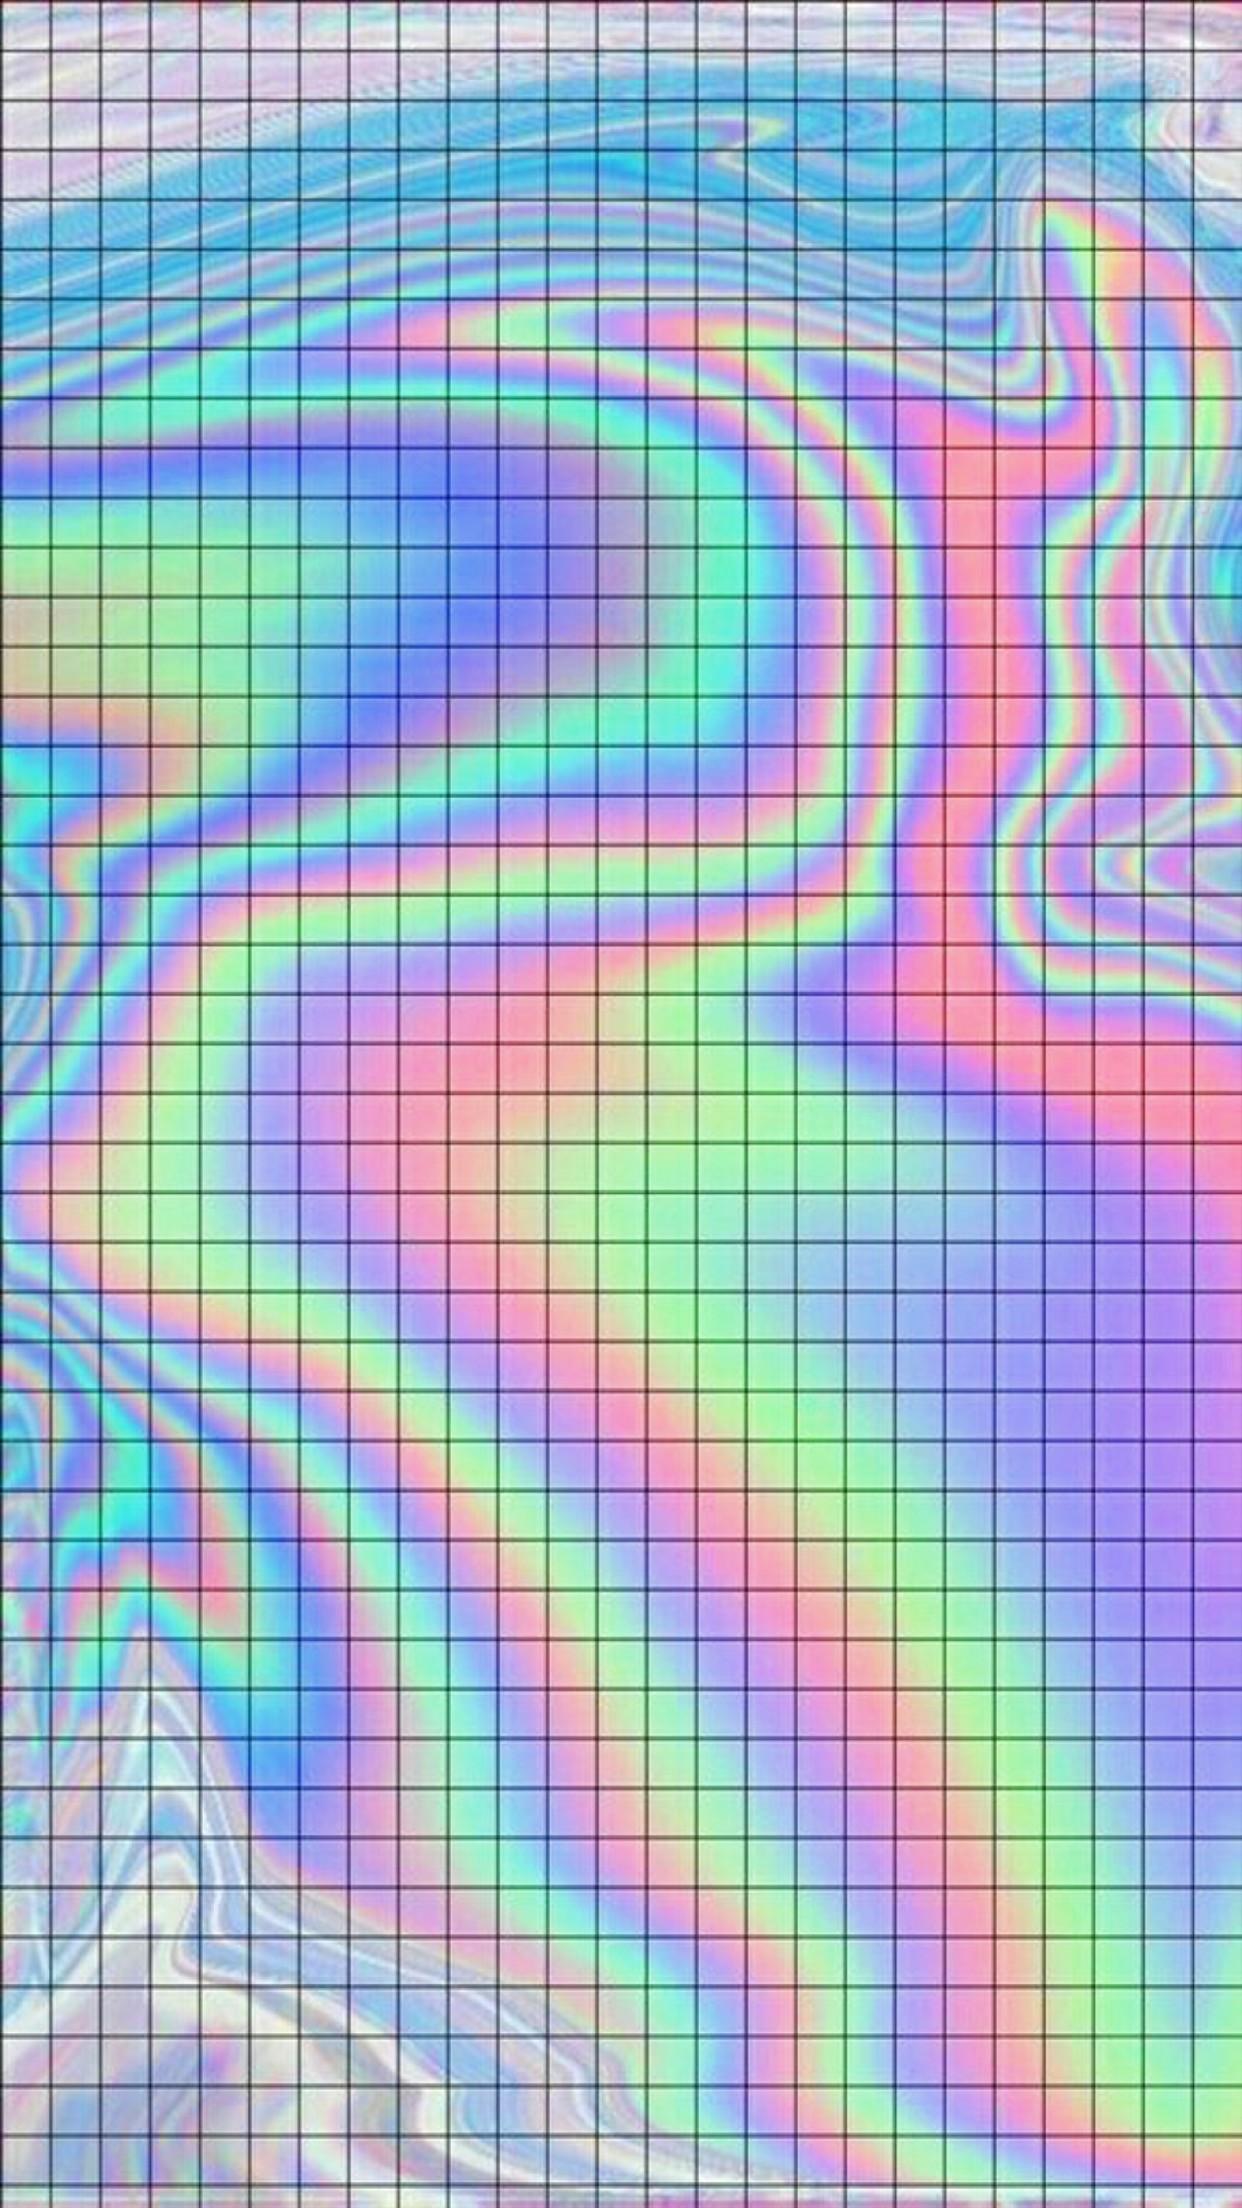 Tumblr Wallpaper Trendy Wallpaper Grid Wallpaper   80s 1242x2208